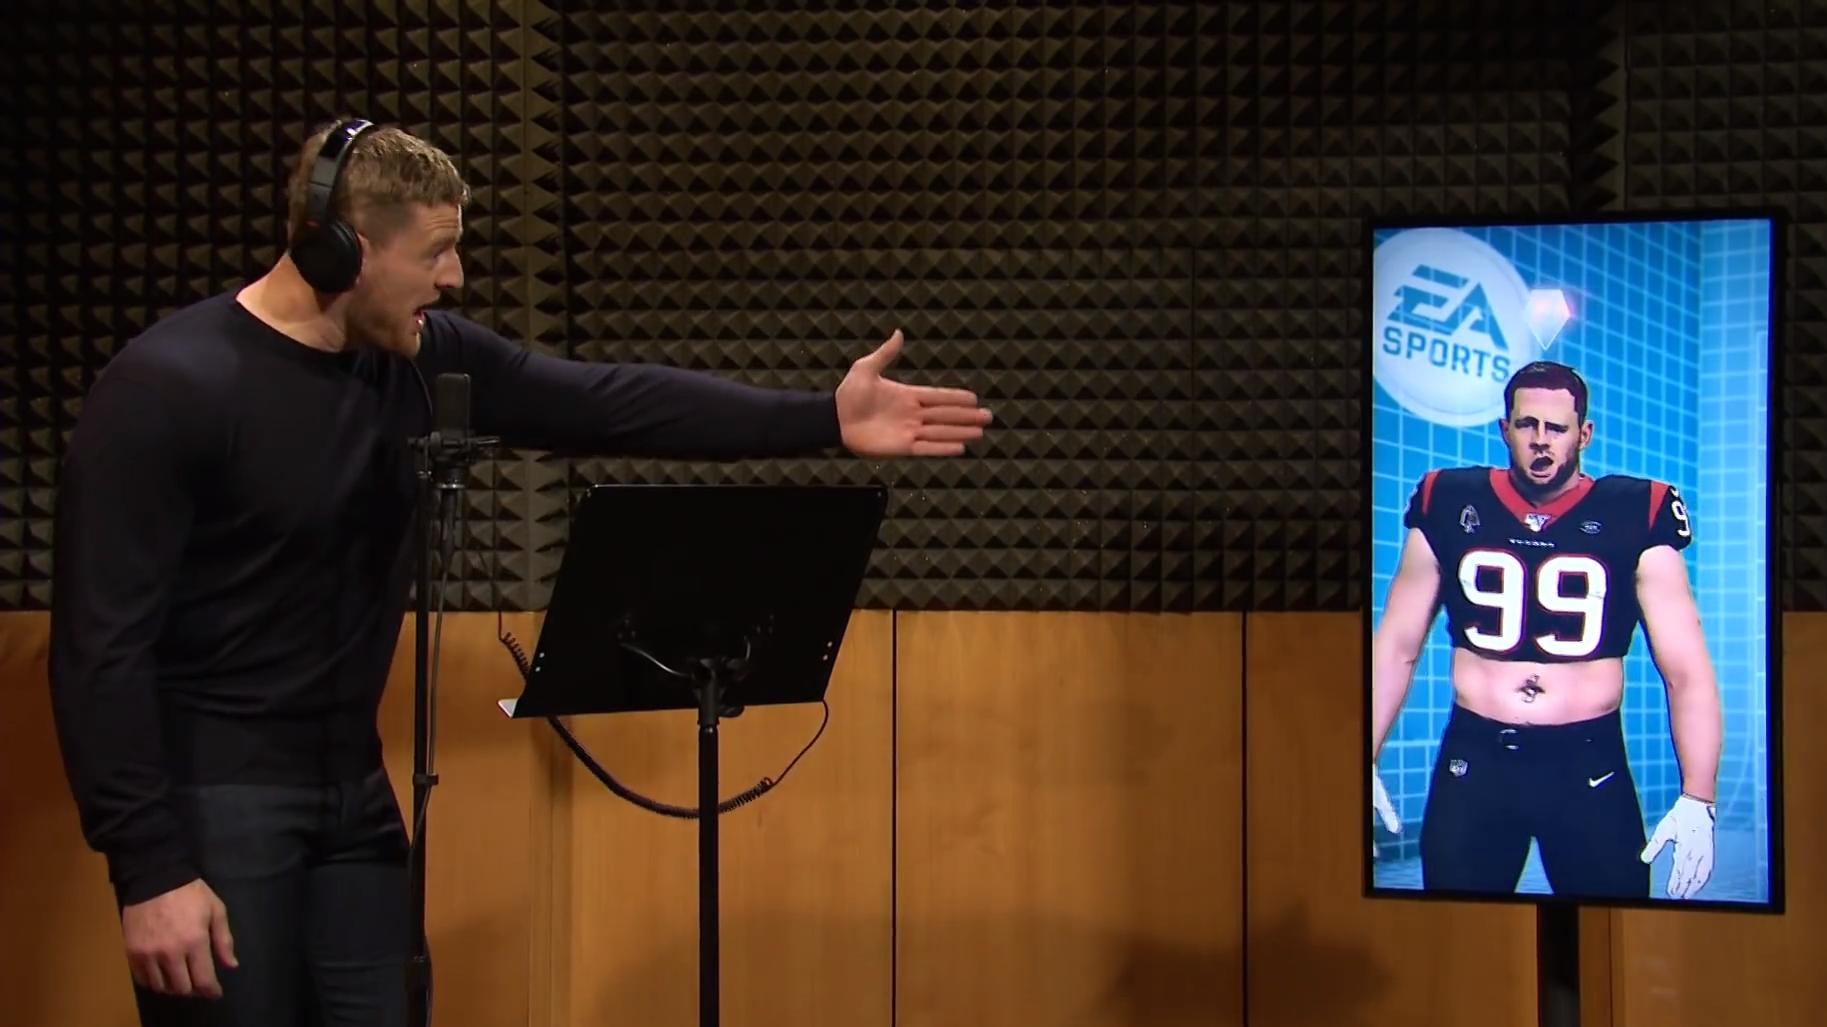 J.J. Watt Isn't Happy With Madden 21 Developers In This SNL Skit